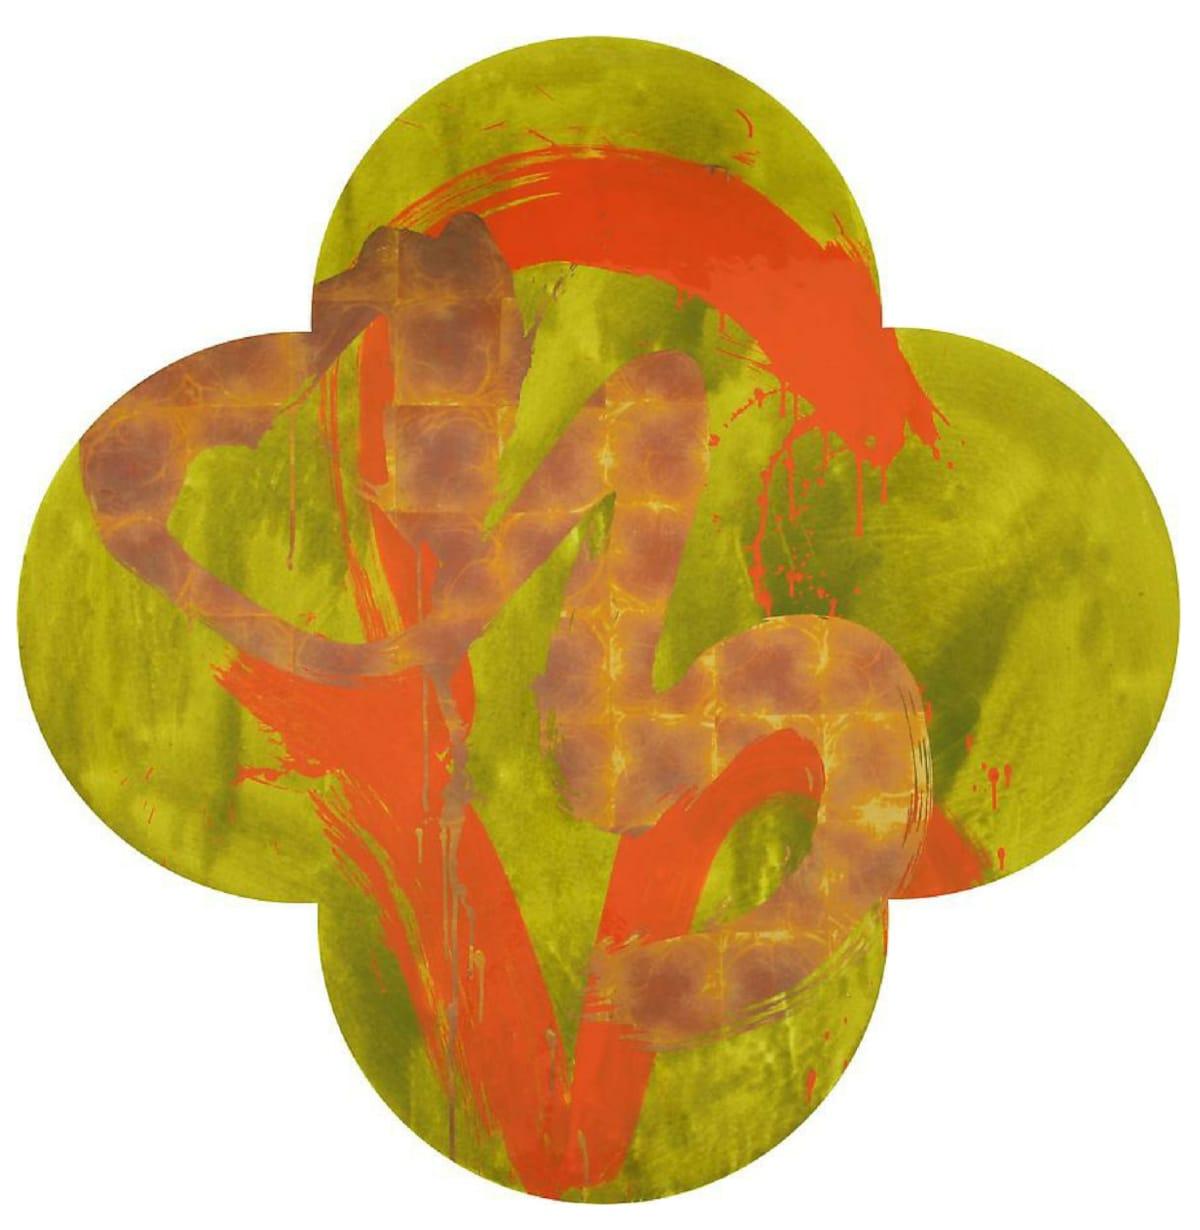 Max GIMBLETT Harvest of Truth, 2016 Mixed media 60 x 60 in 152.4 x 152.4 cm